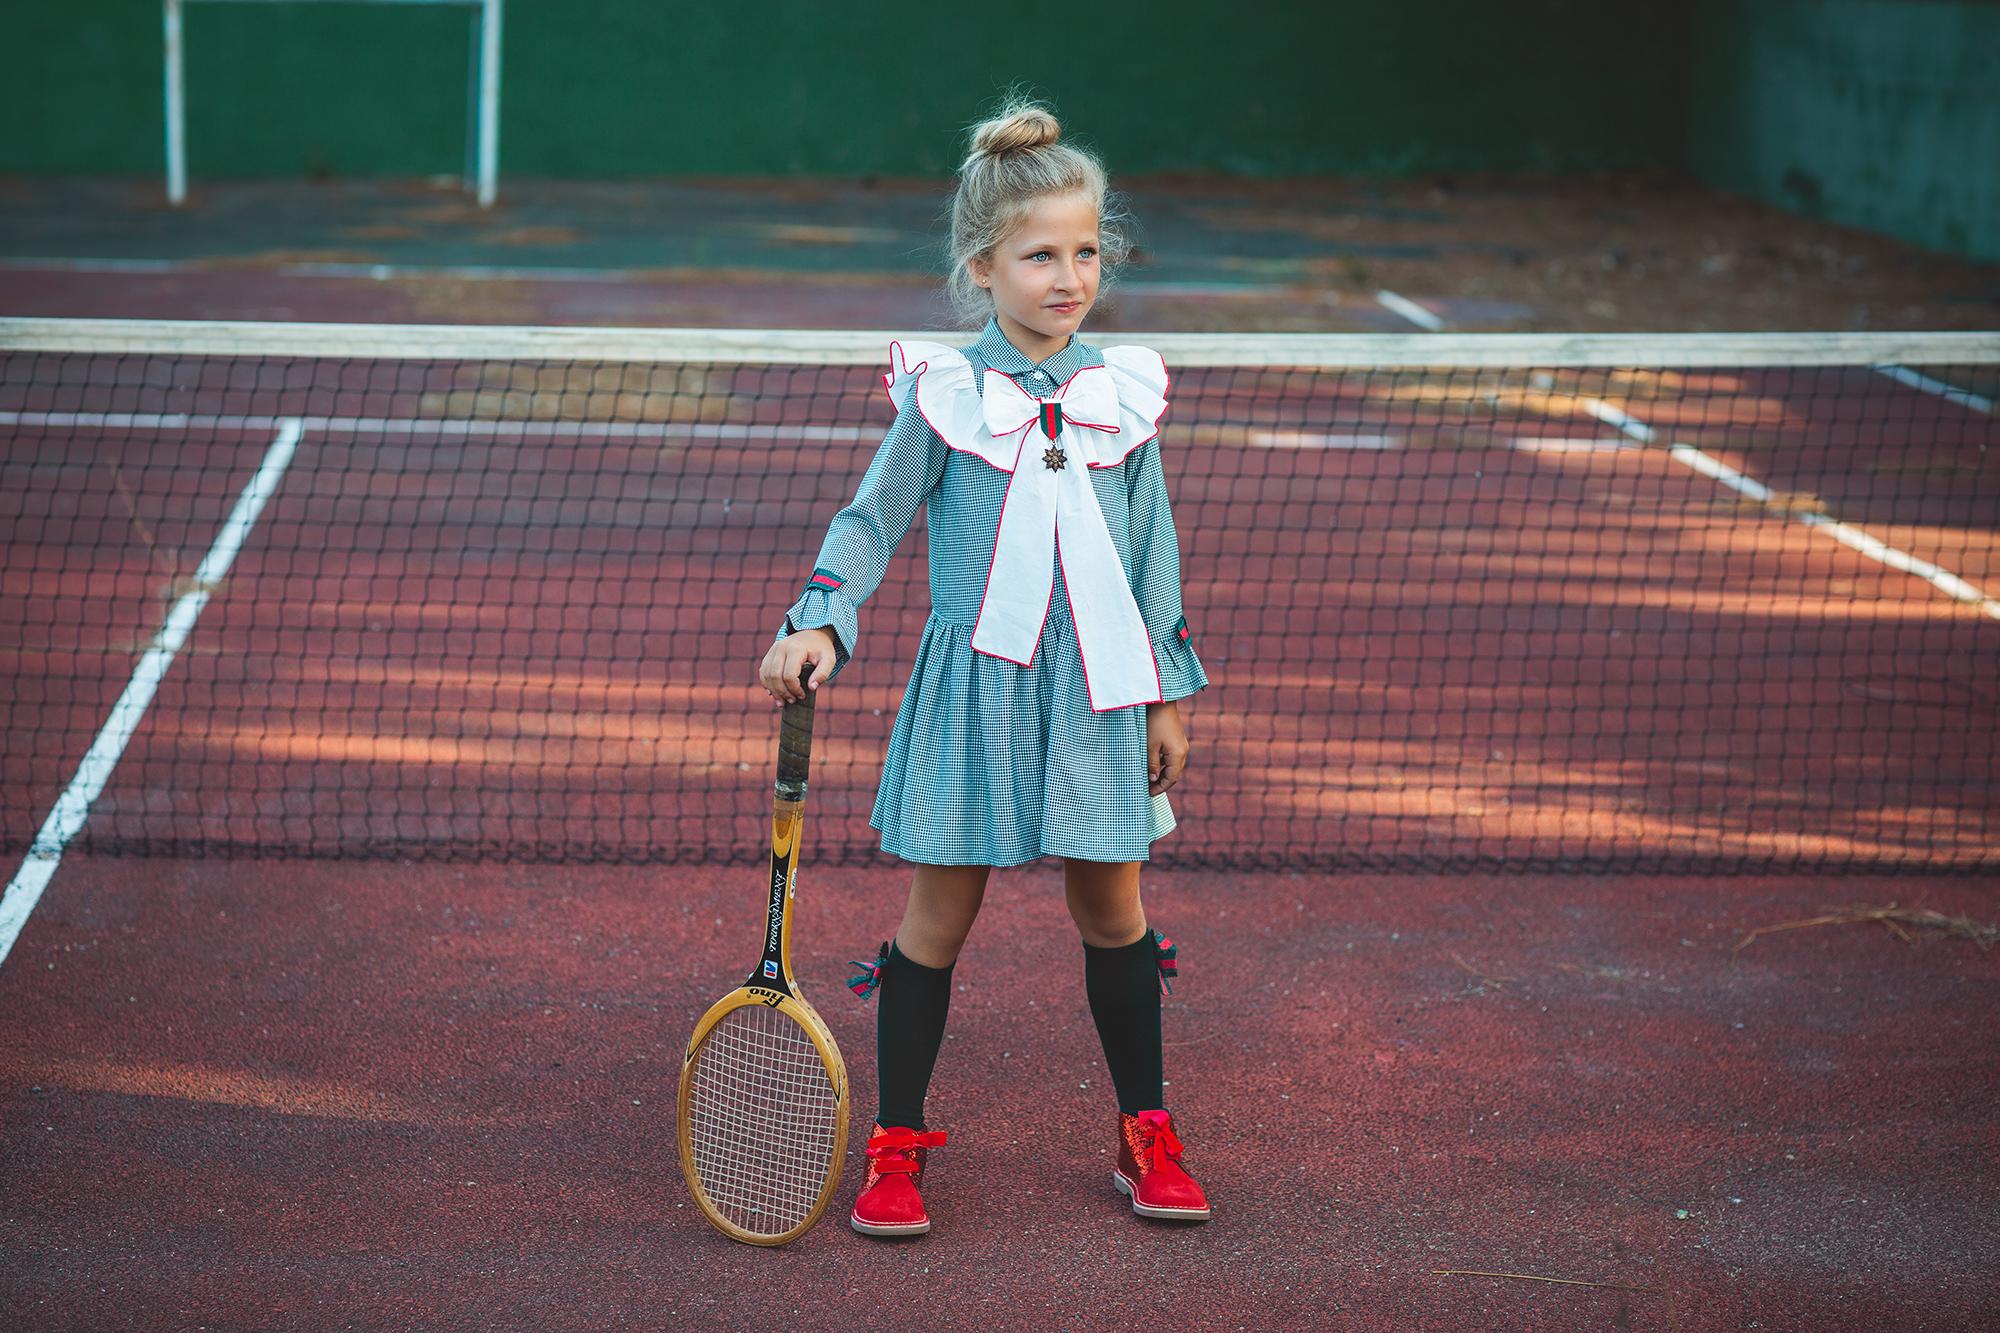 Fotografo de moda infantil